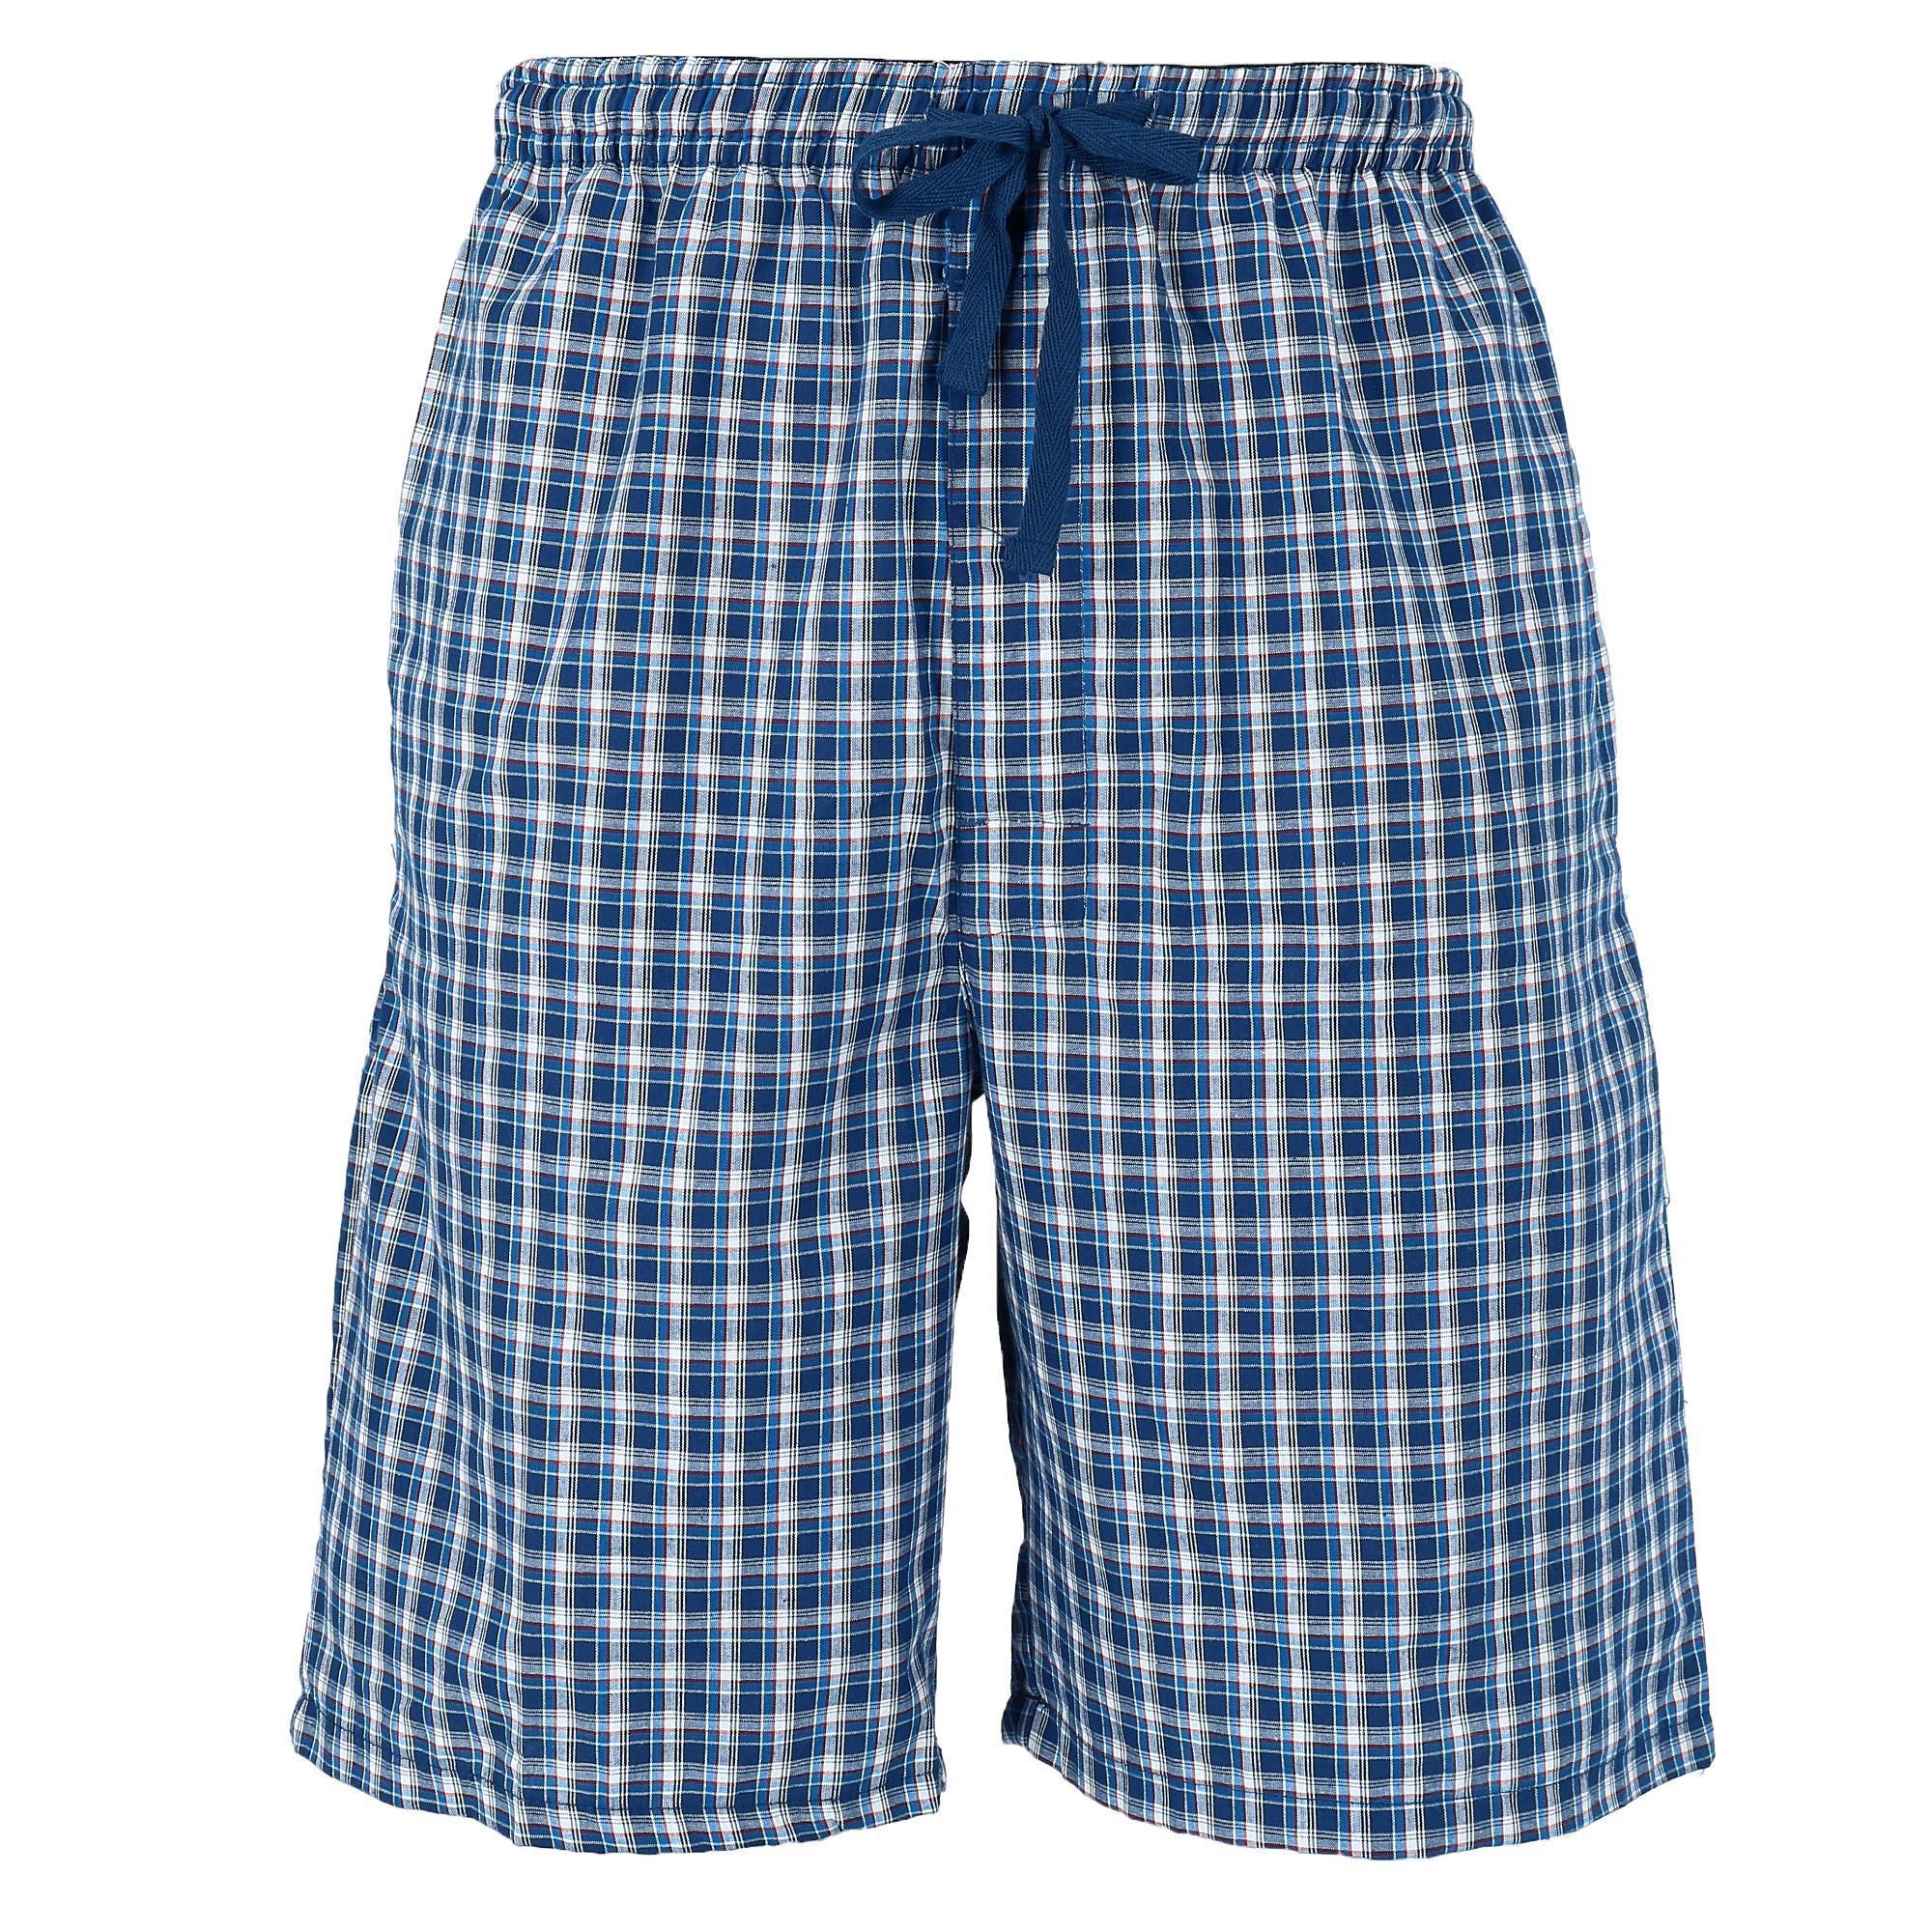 New Hanes Men S Cotton Madras Drawstring Sleep Pajama